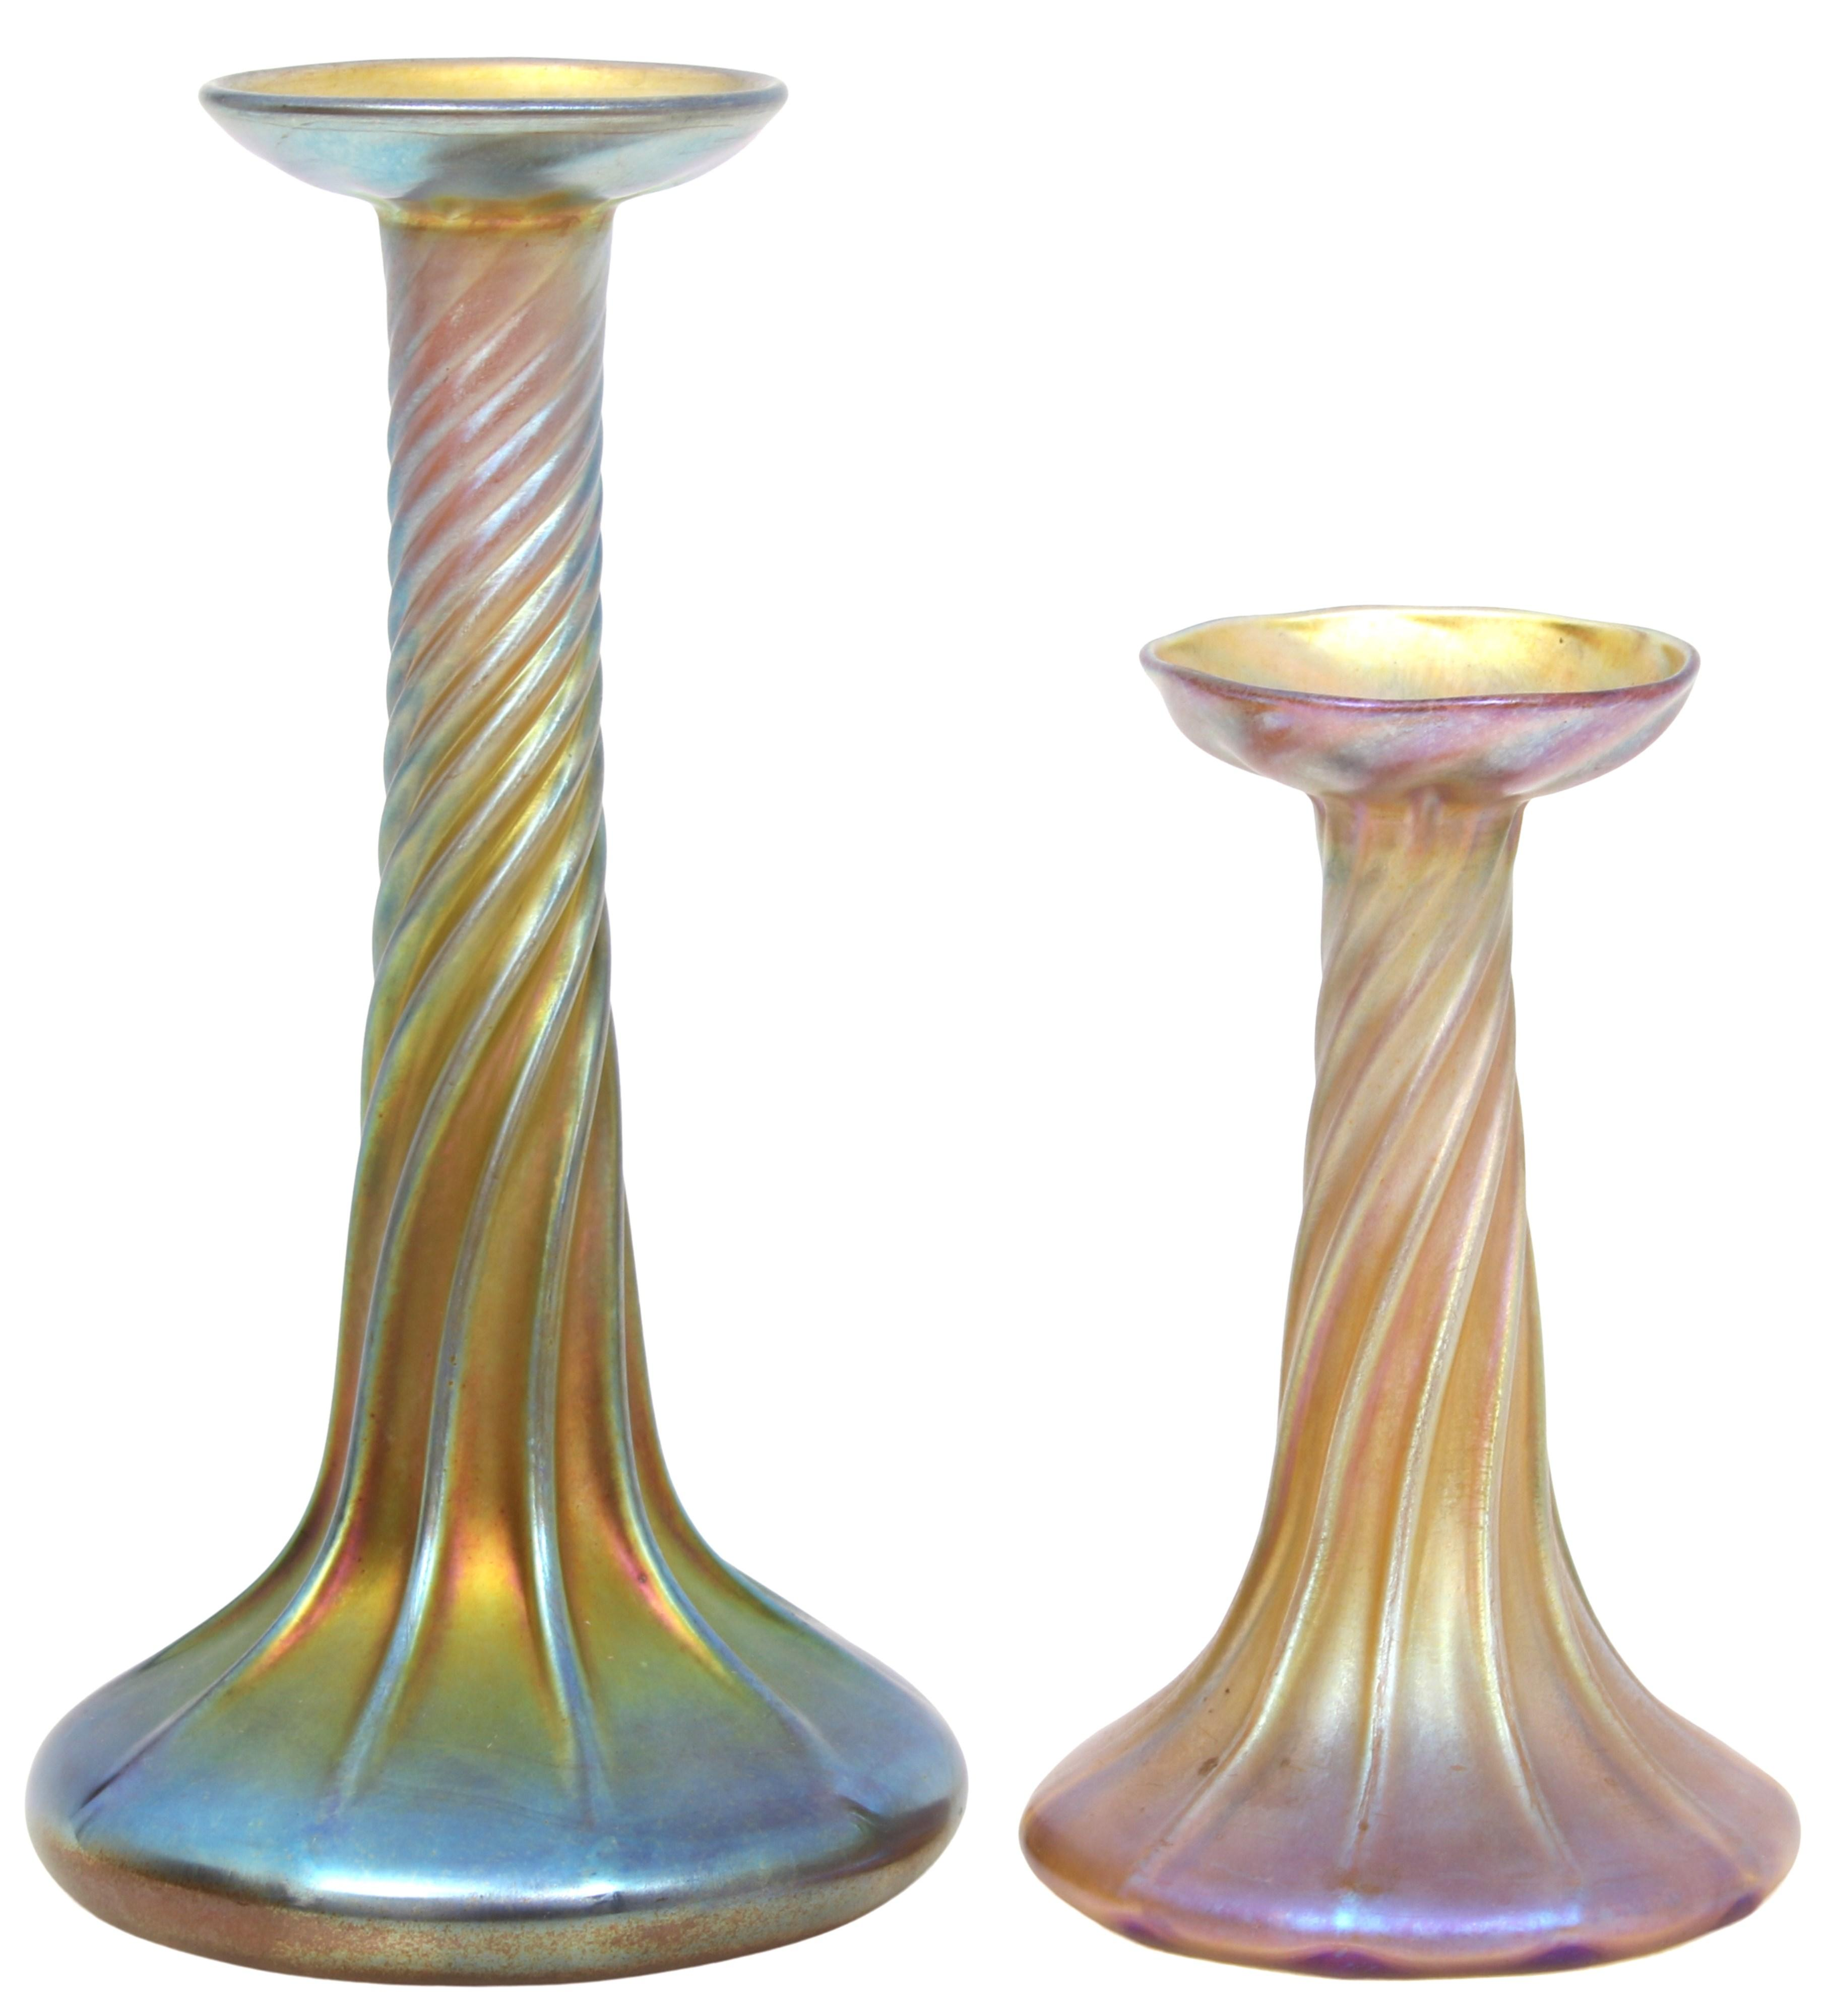 Tiffany Studios Candle Lamp Bases